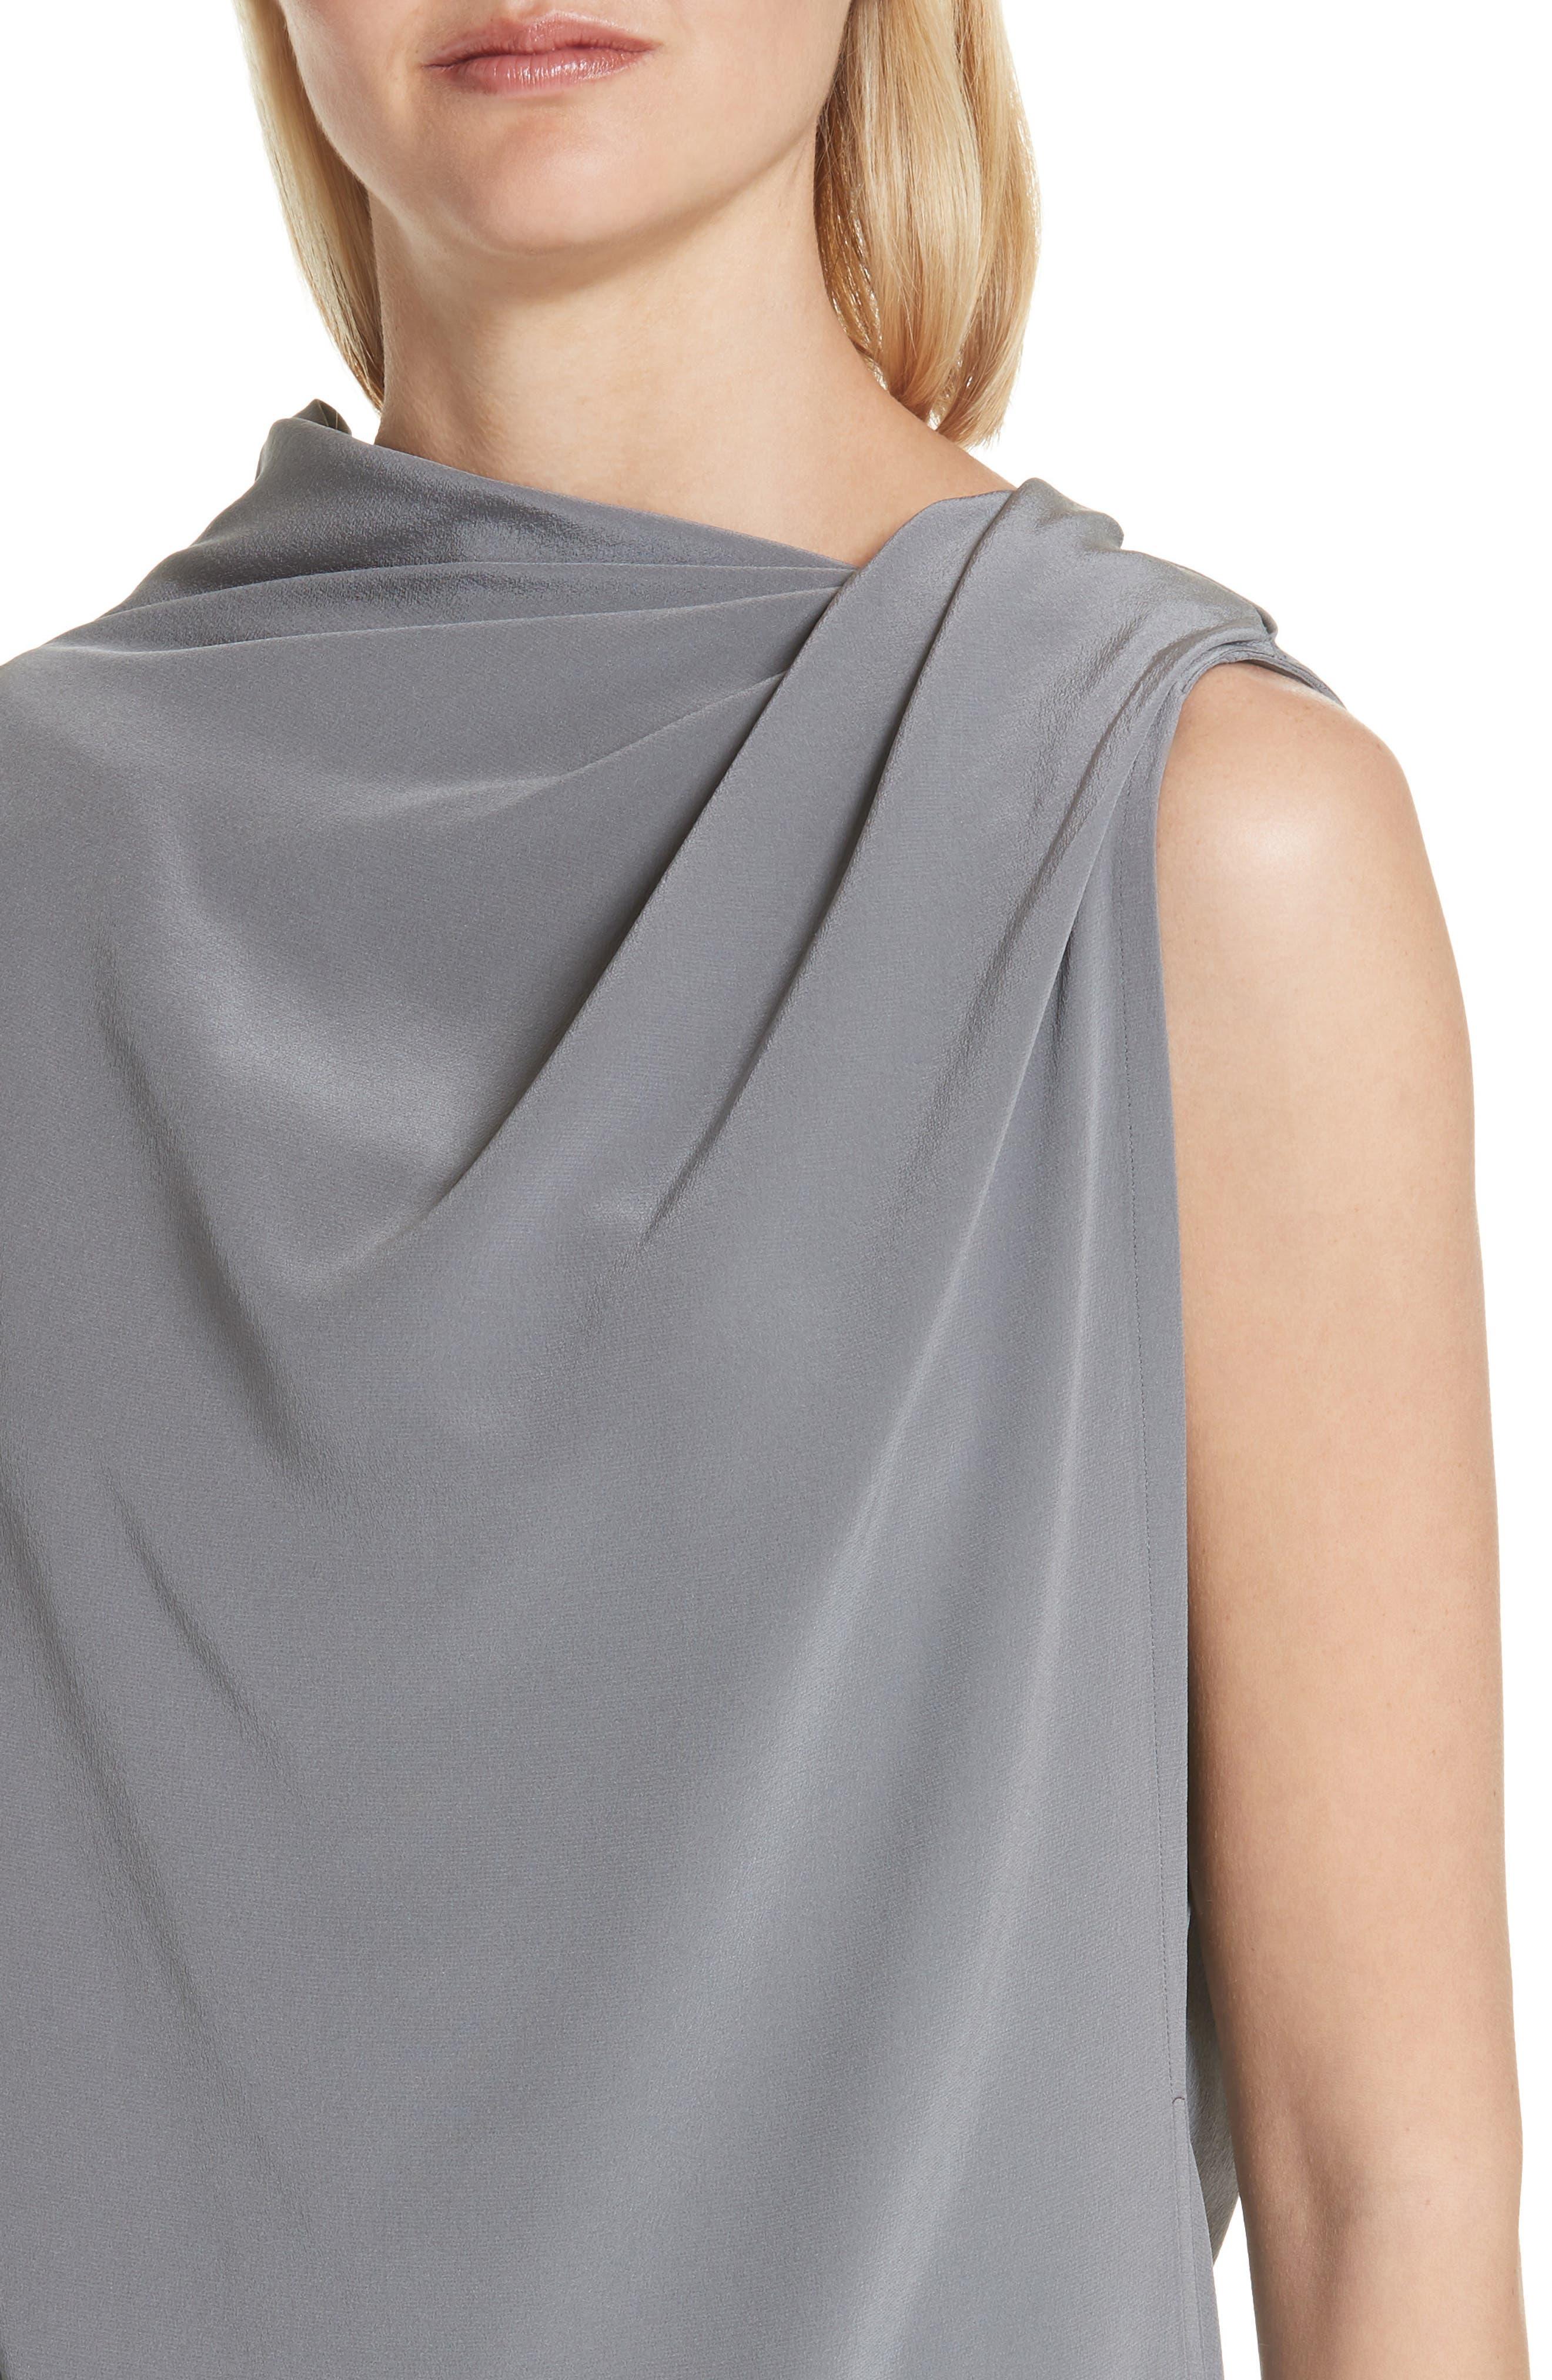 Draped Silk Tank Top,                             Alternate thumbnail 4, color,                             Grey